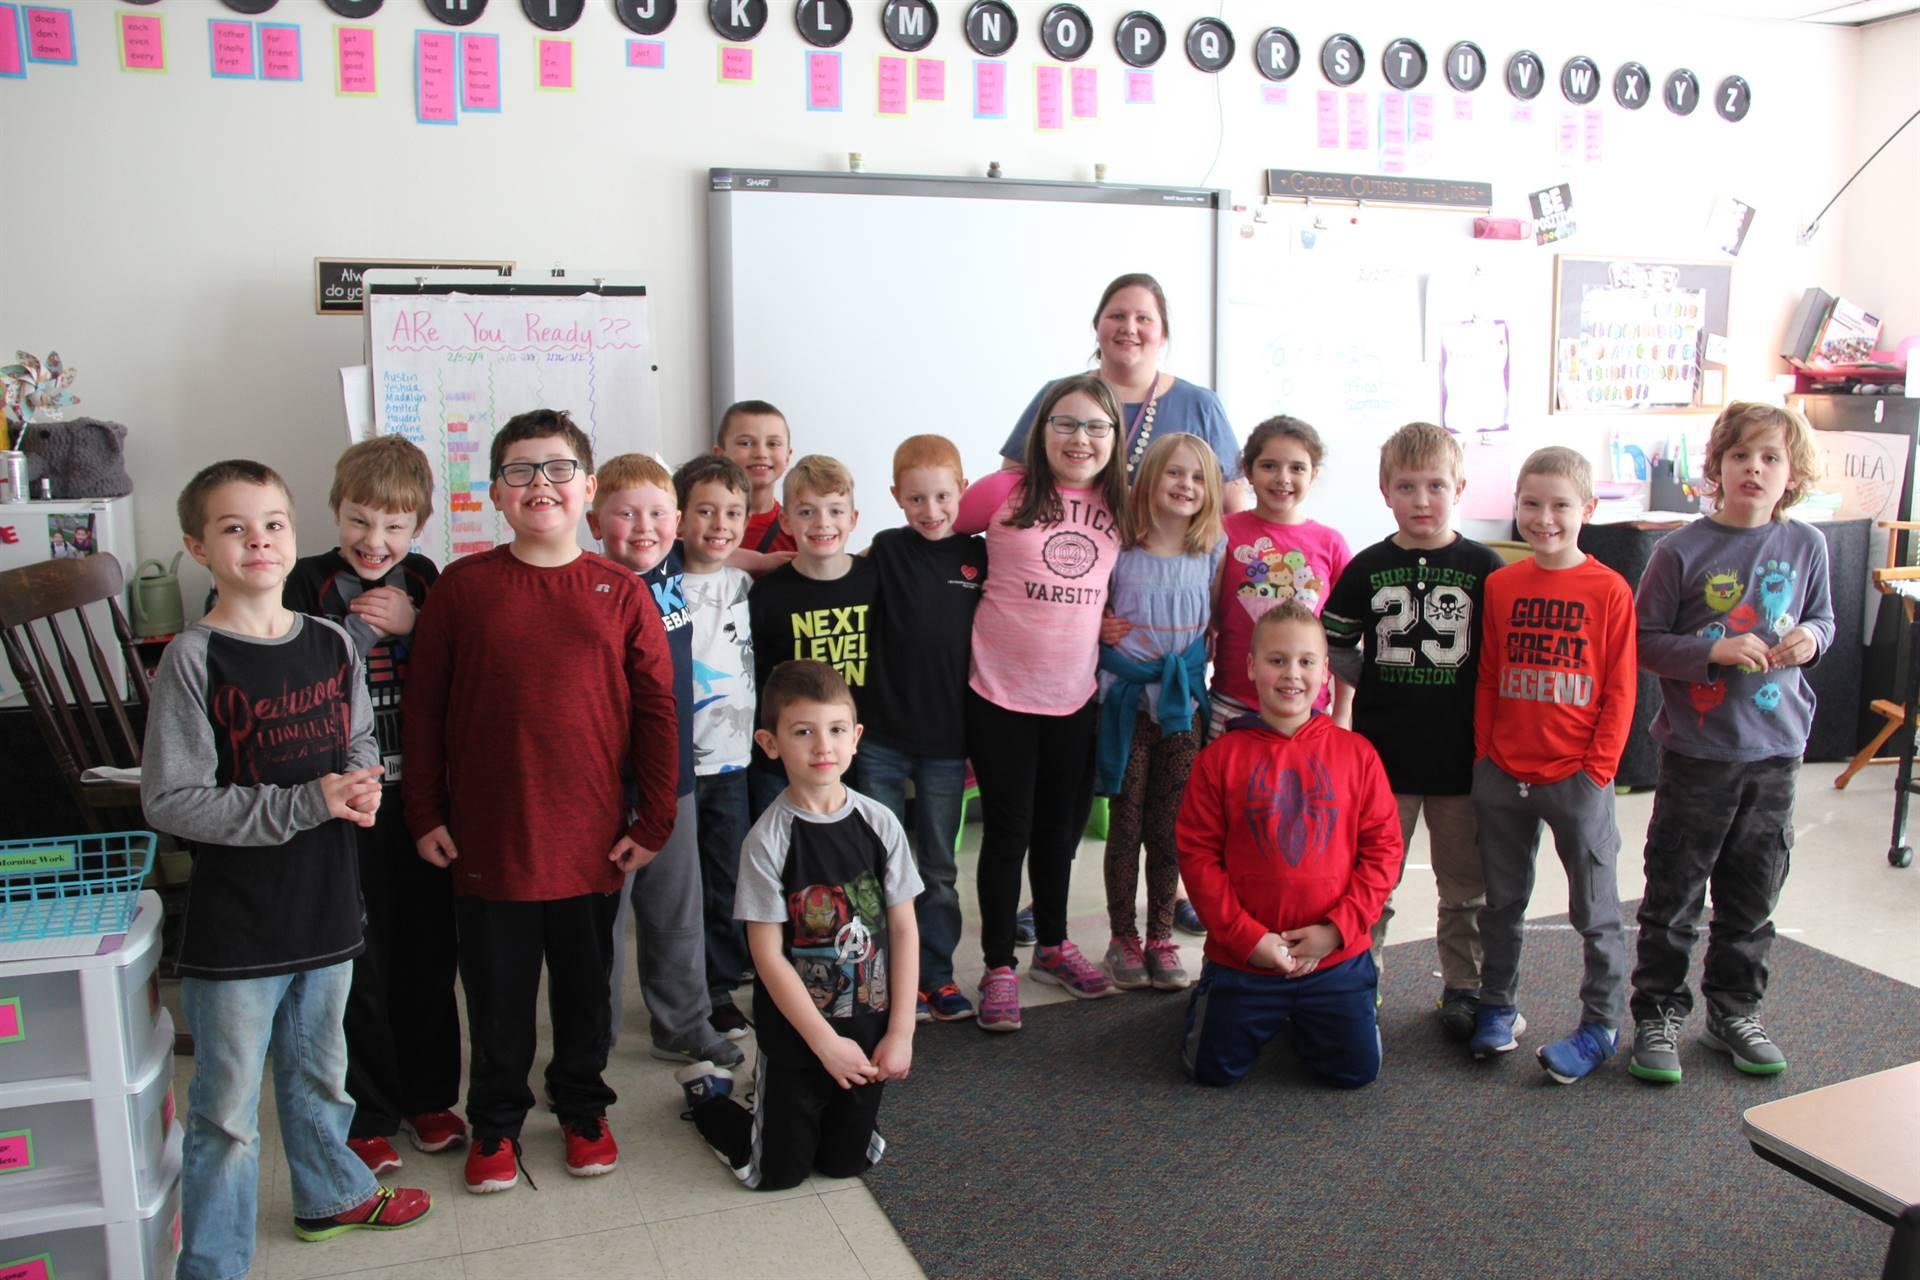 second grade class smiling with teacher